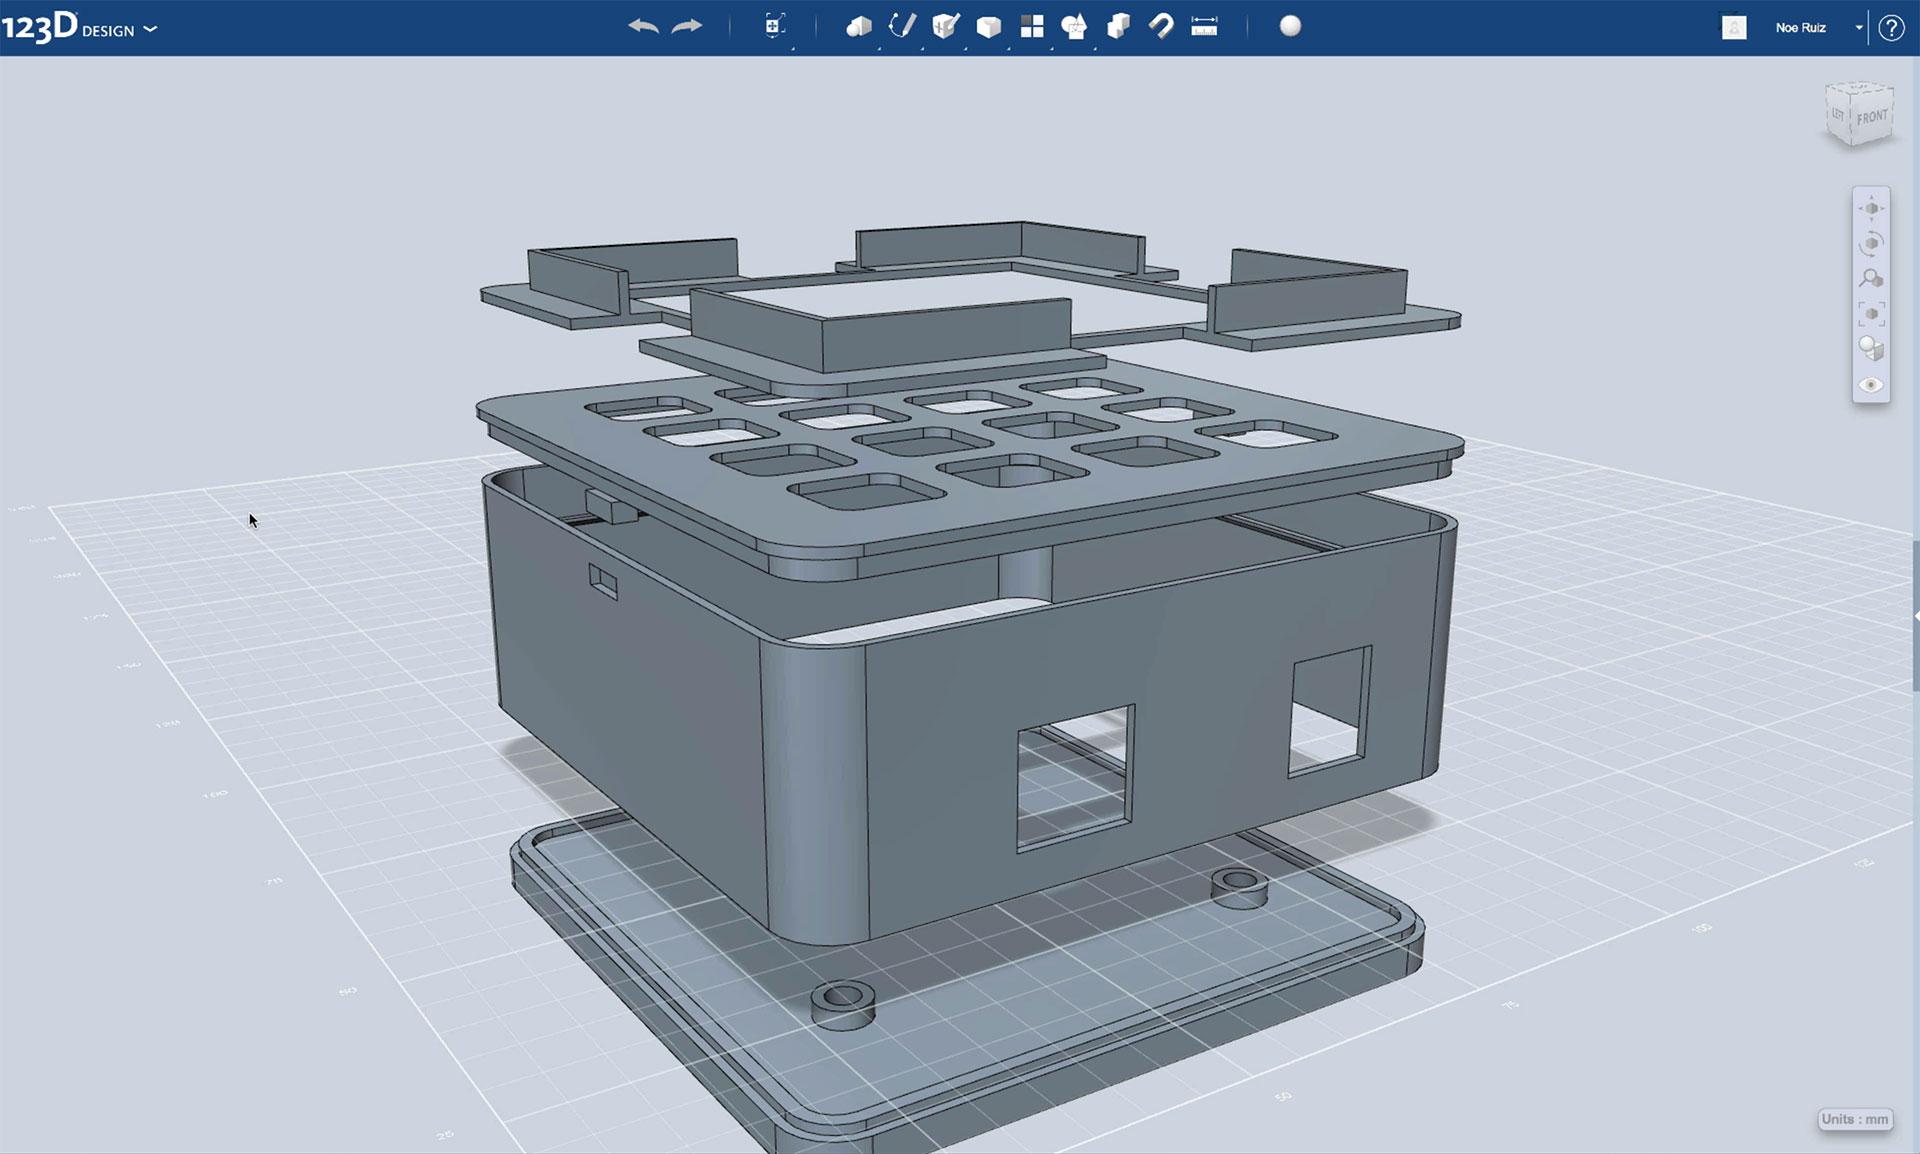 3d_printing_case-123d.jpg